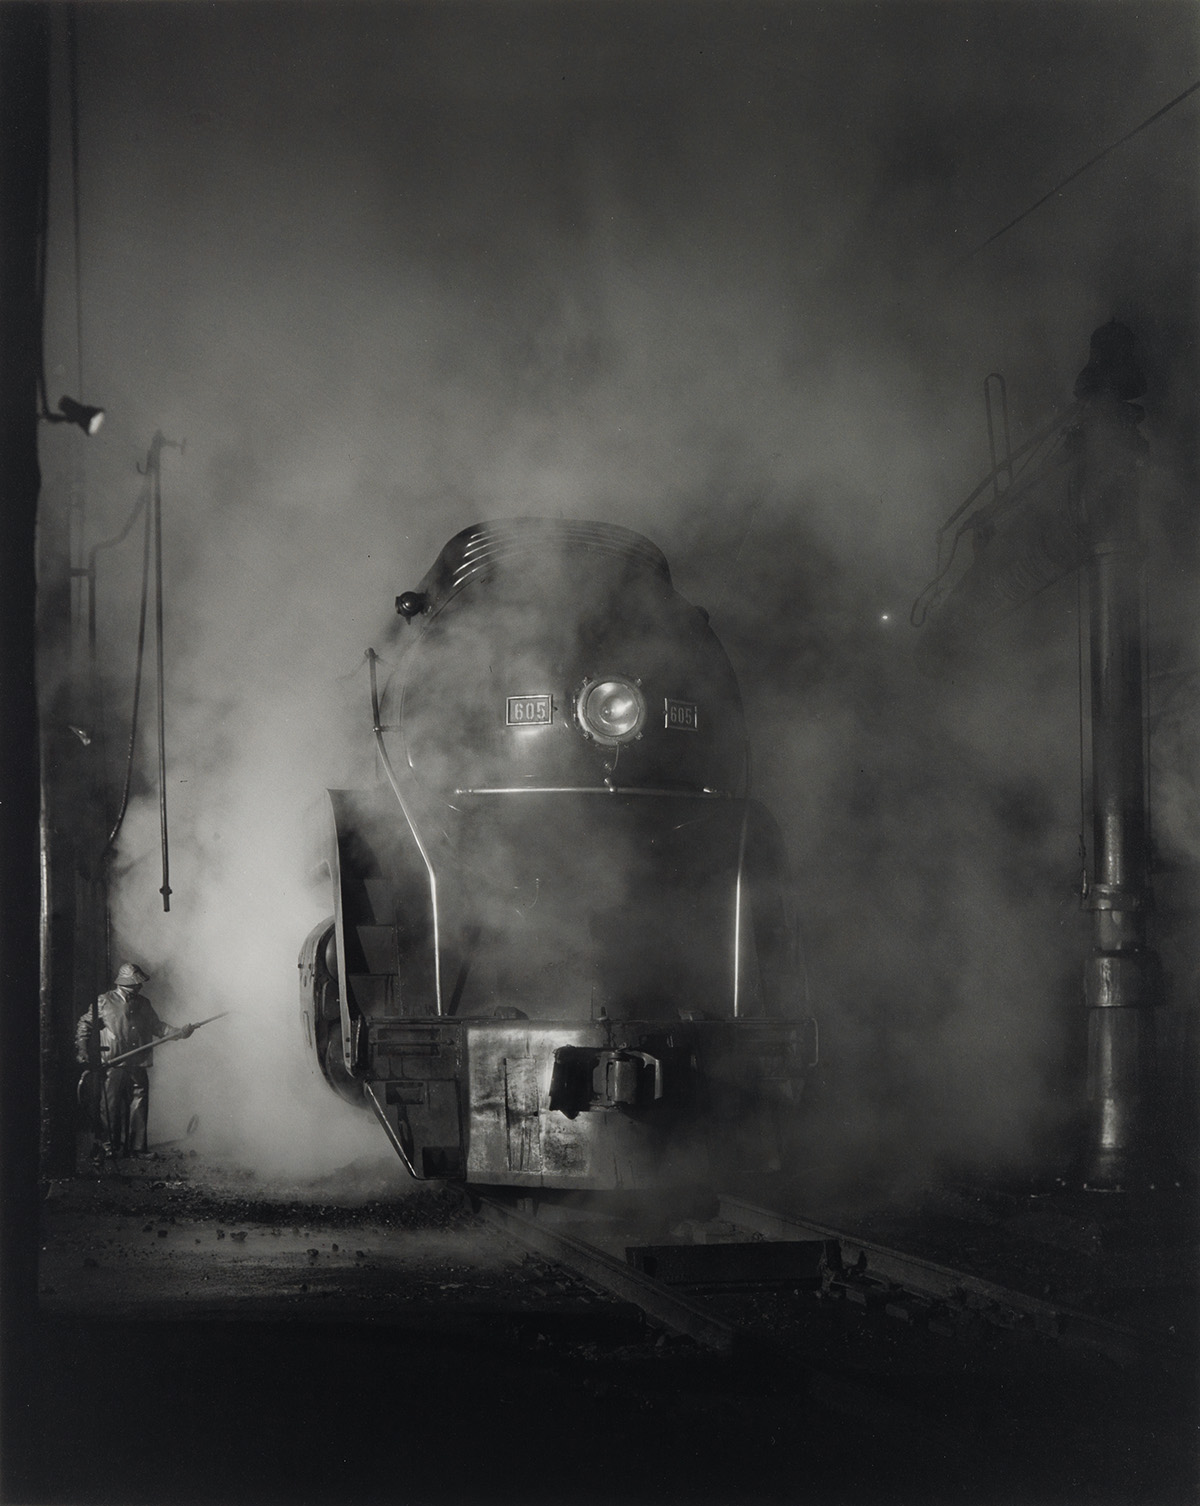 O-WINSTON-LINK-(1914-2001)-Washing-J-Class-605-at-Schaeffers